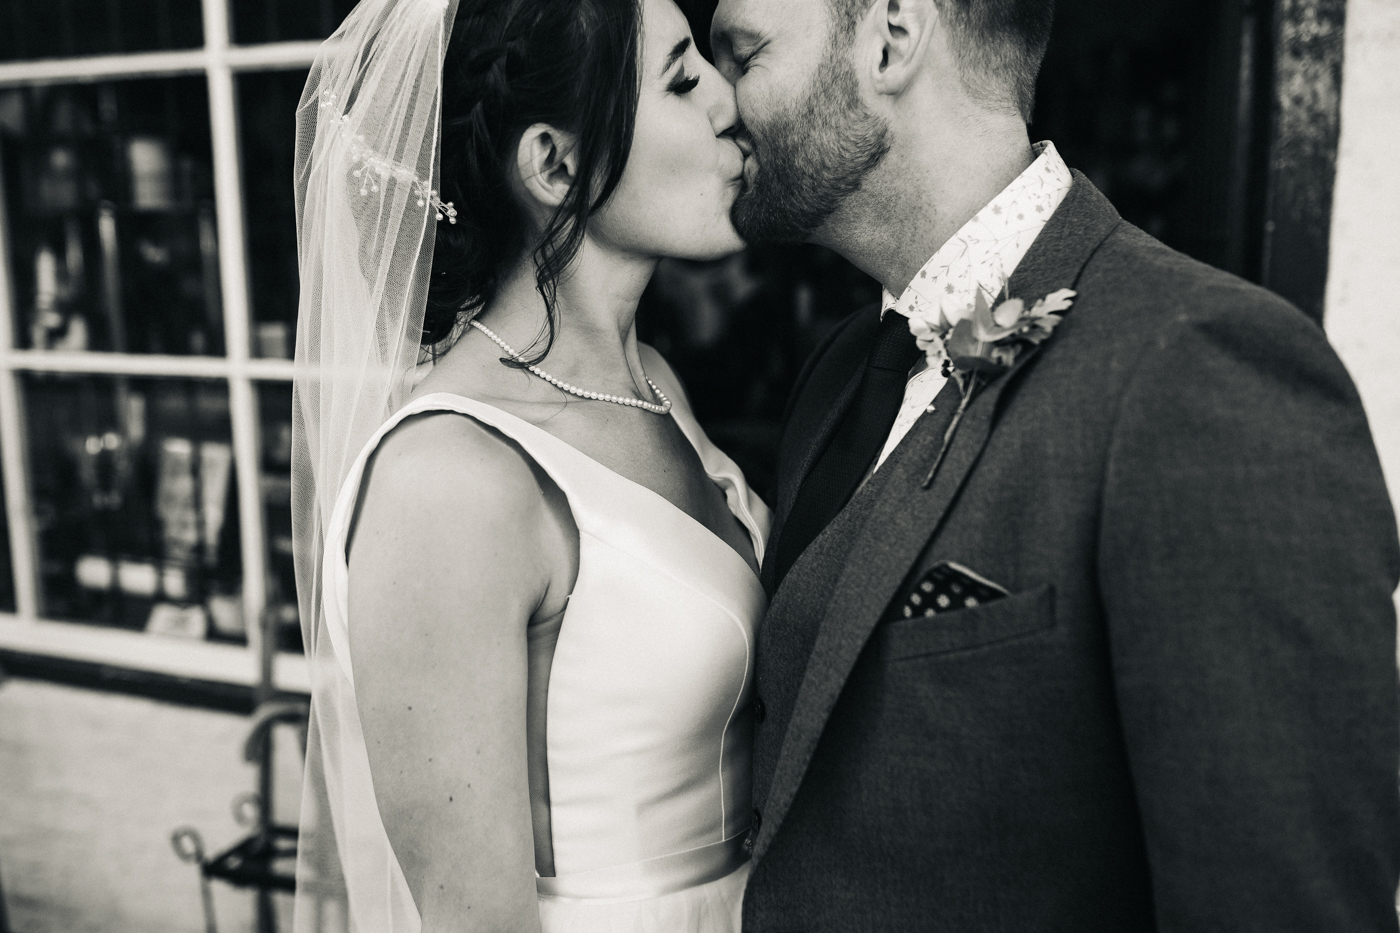 york-house-malton-wedding-photographer-north-yorkshire-0026.jpg